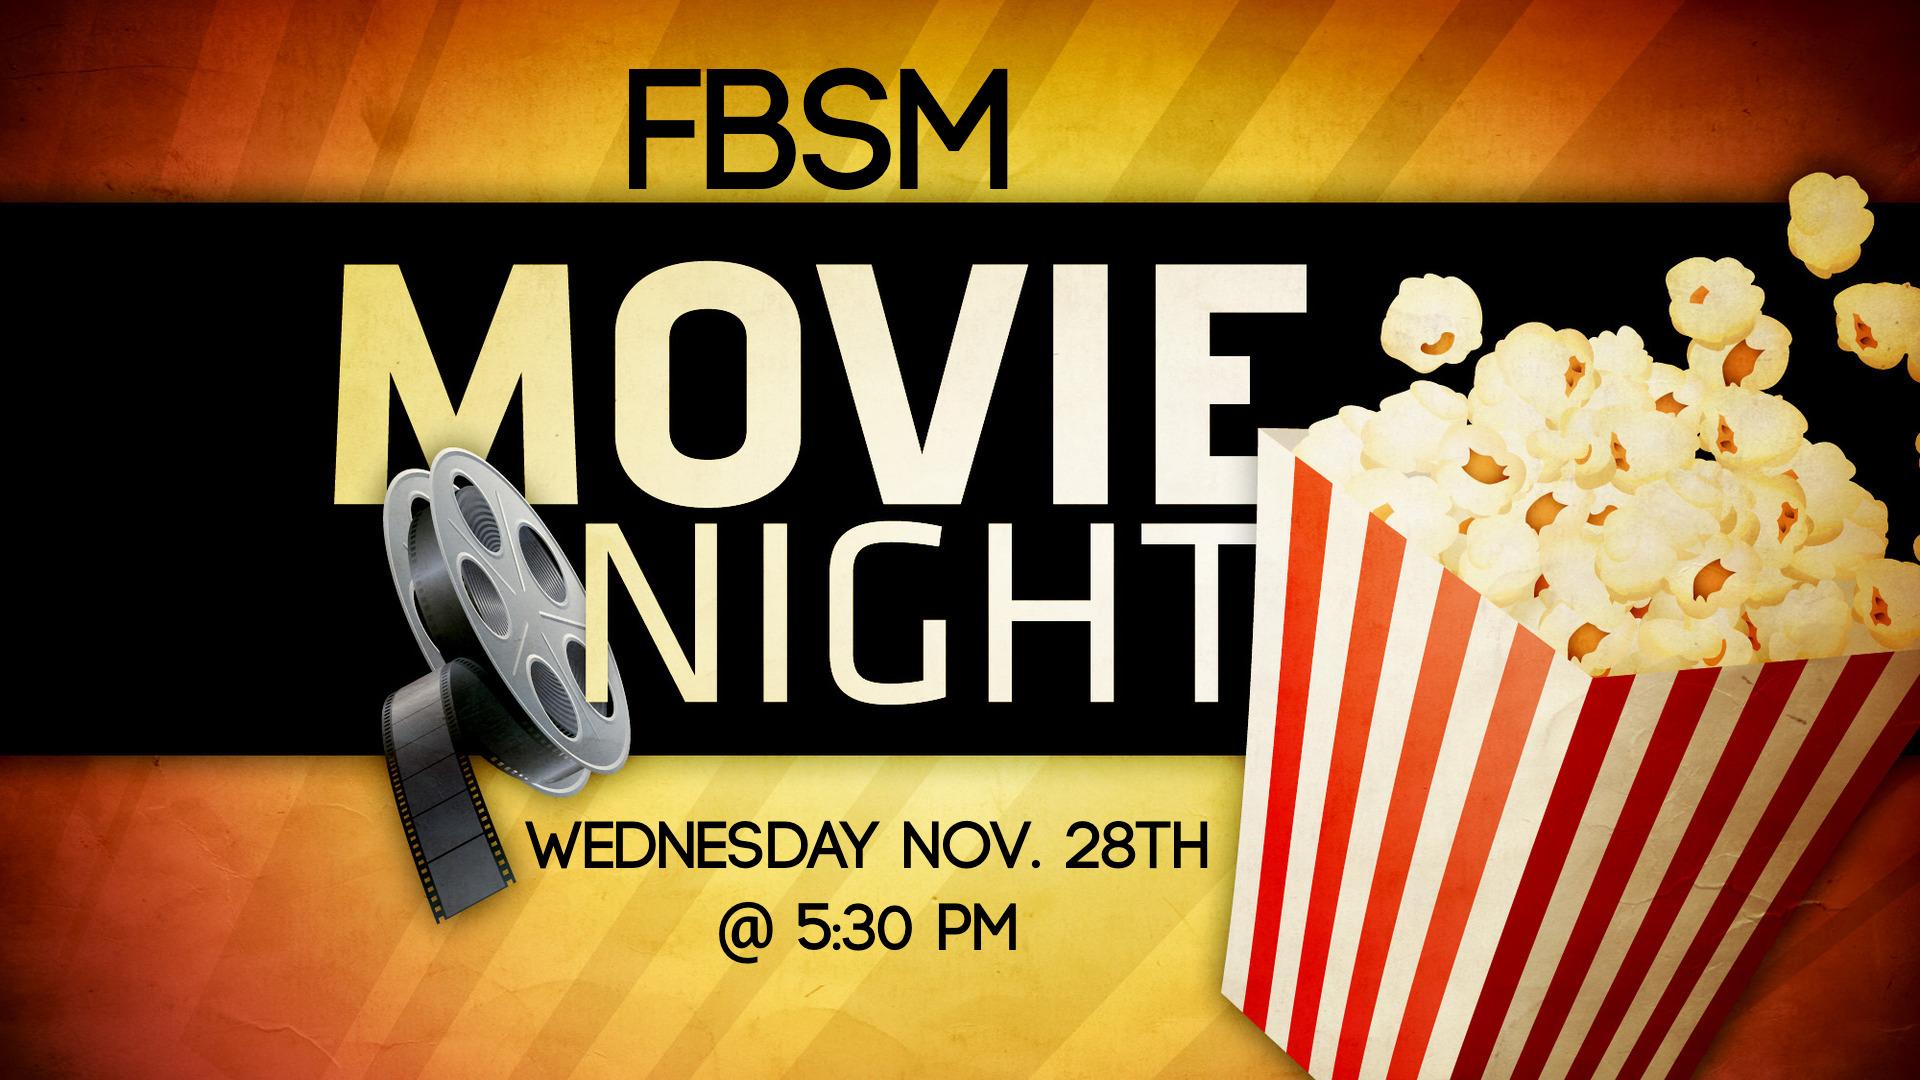 FBSM Movie Night Graphic.jpg